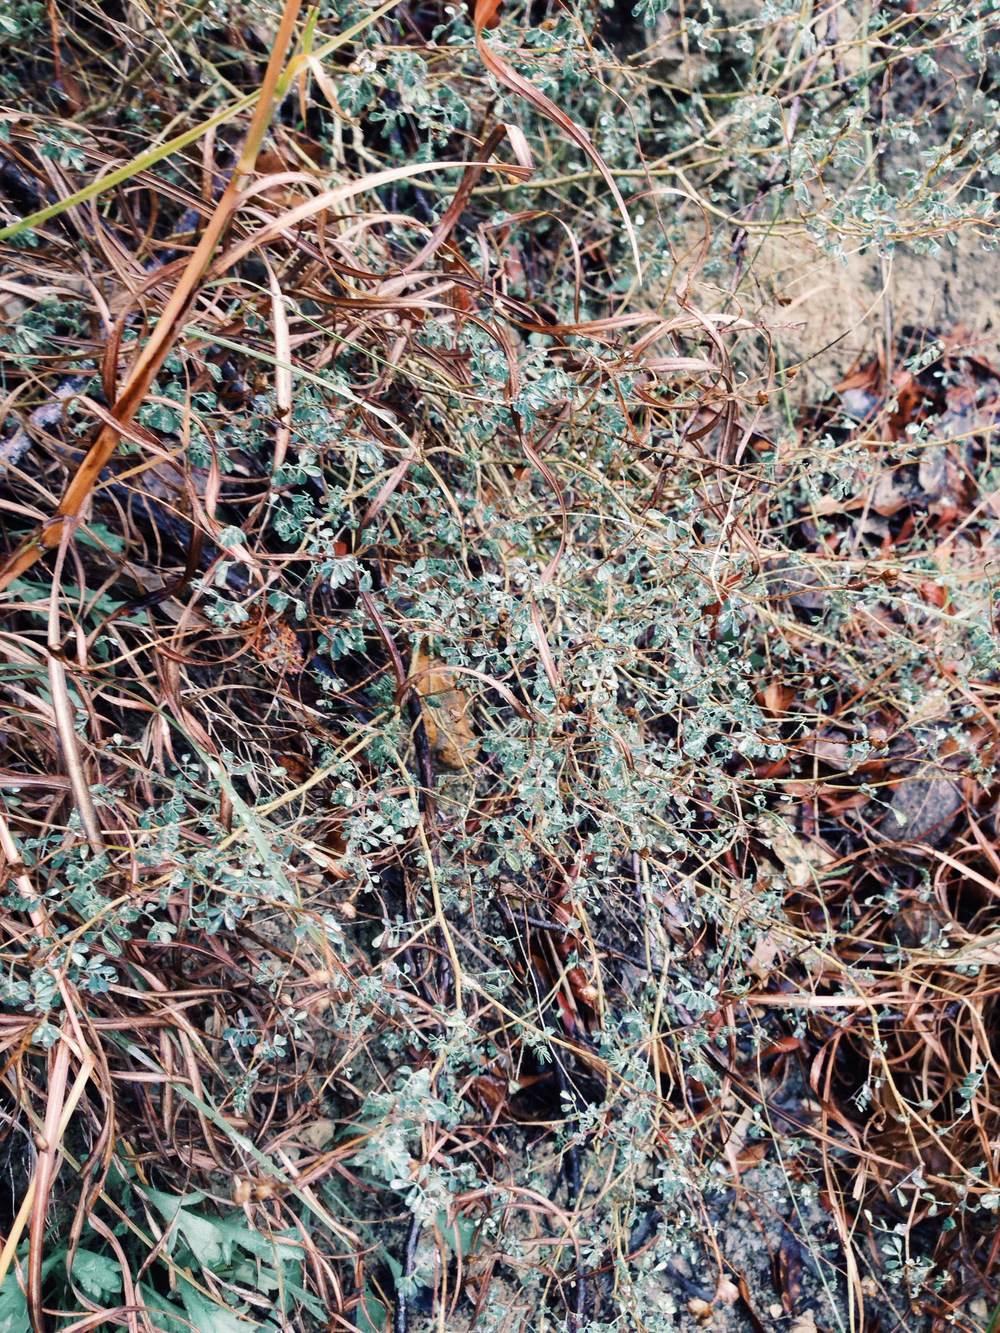 Plant: Dalea frutescens (?), Black Dalea | Location: Double Eagle Ranch, Burnet Co., Texas